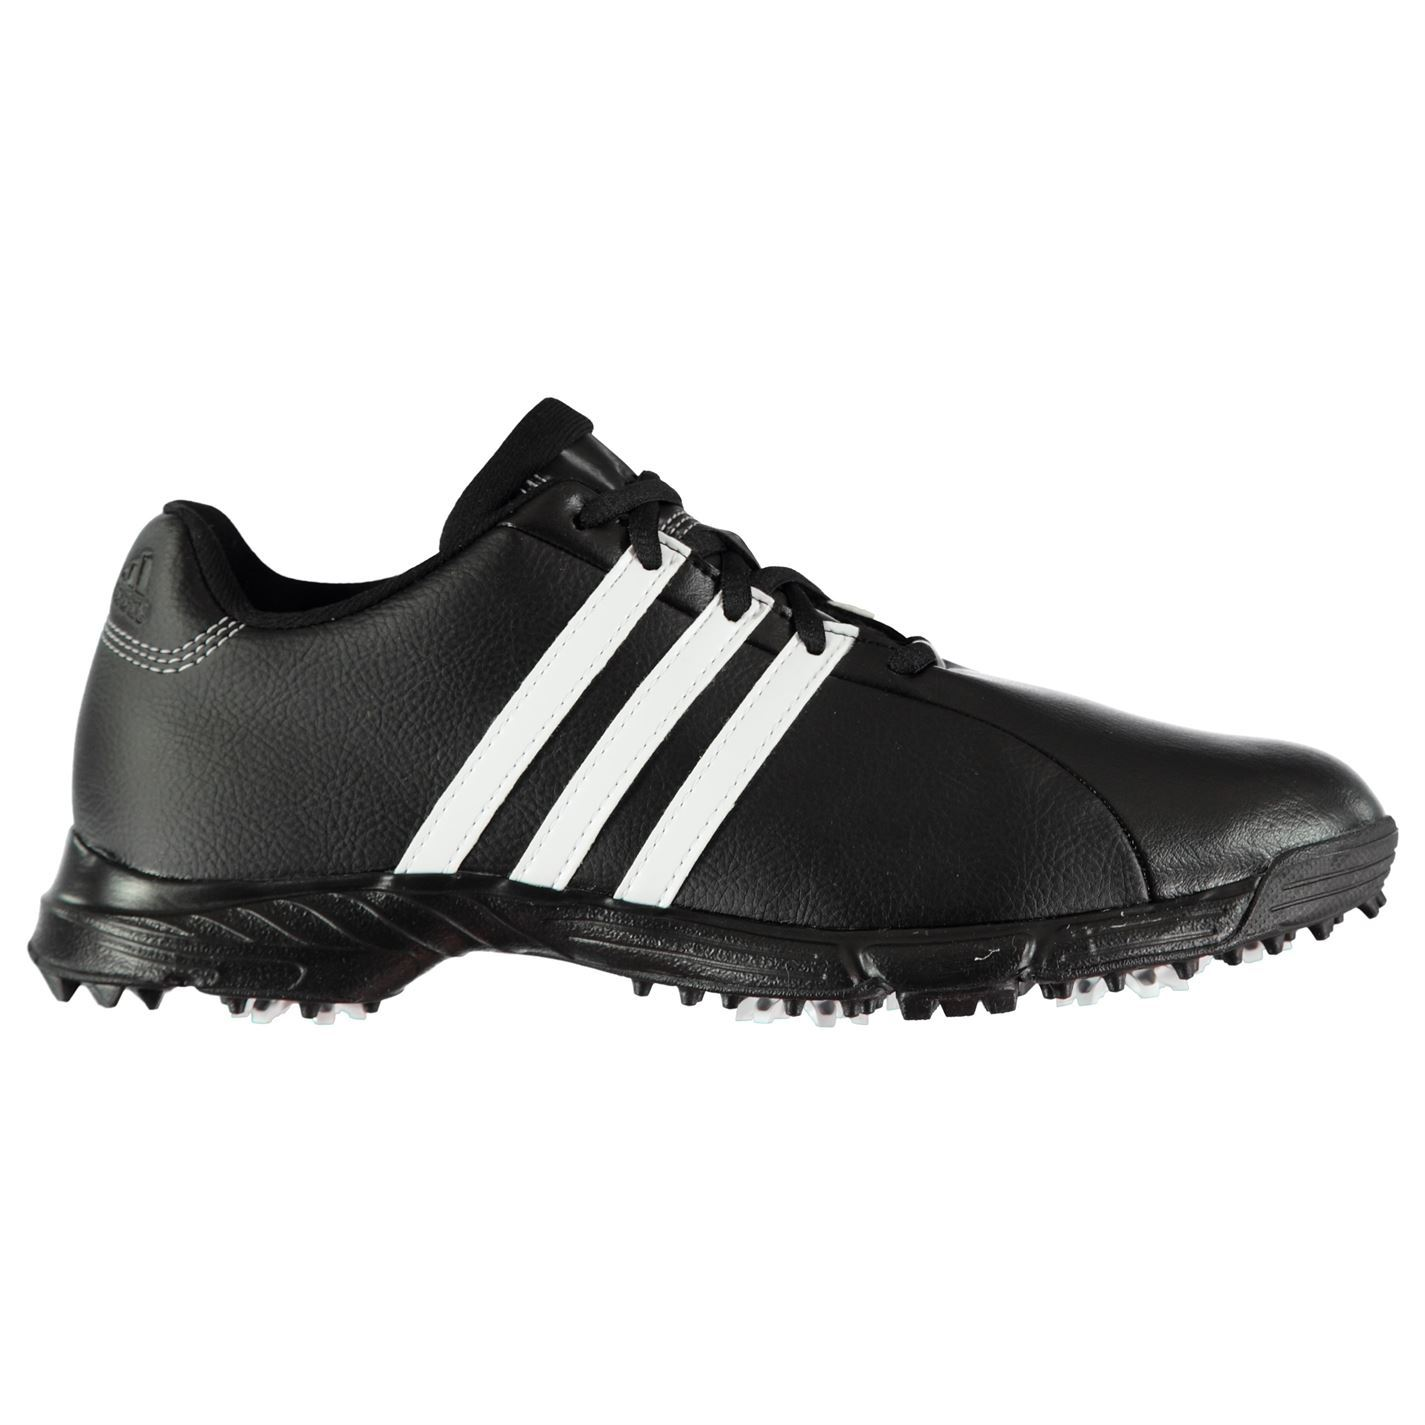 adidas-Golflite-Golf-Shoes-Mens-Spikes-Footwear thumbnail 10